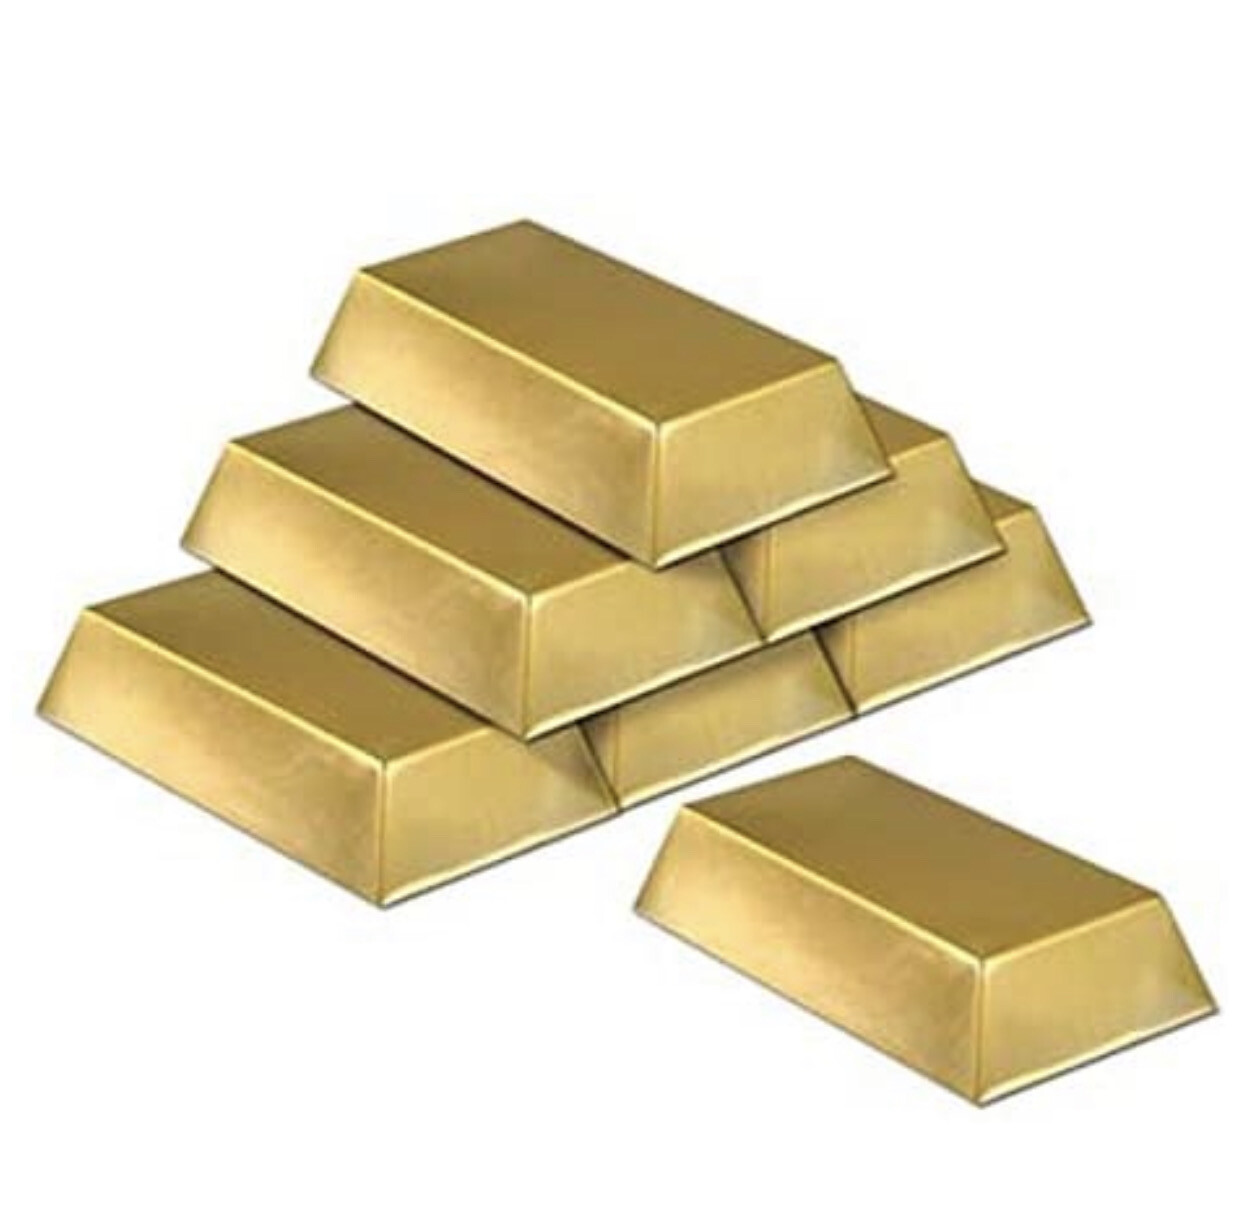 Plastic Gold Bar / Lingotes De Oro (pk-6)